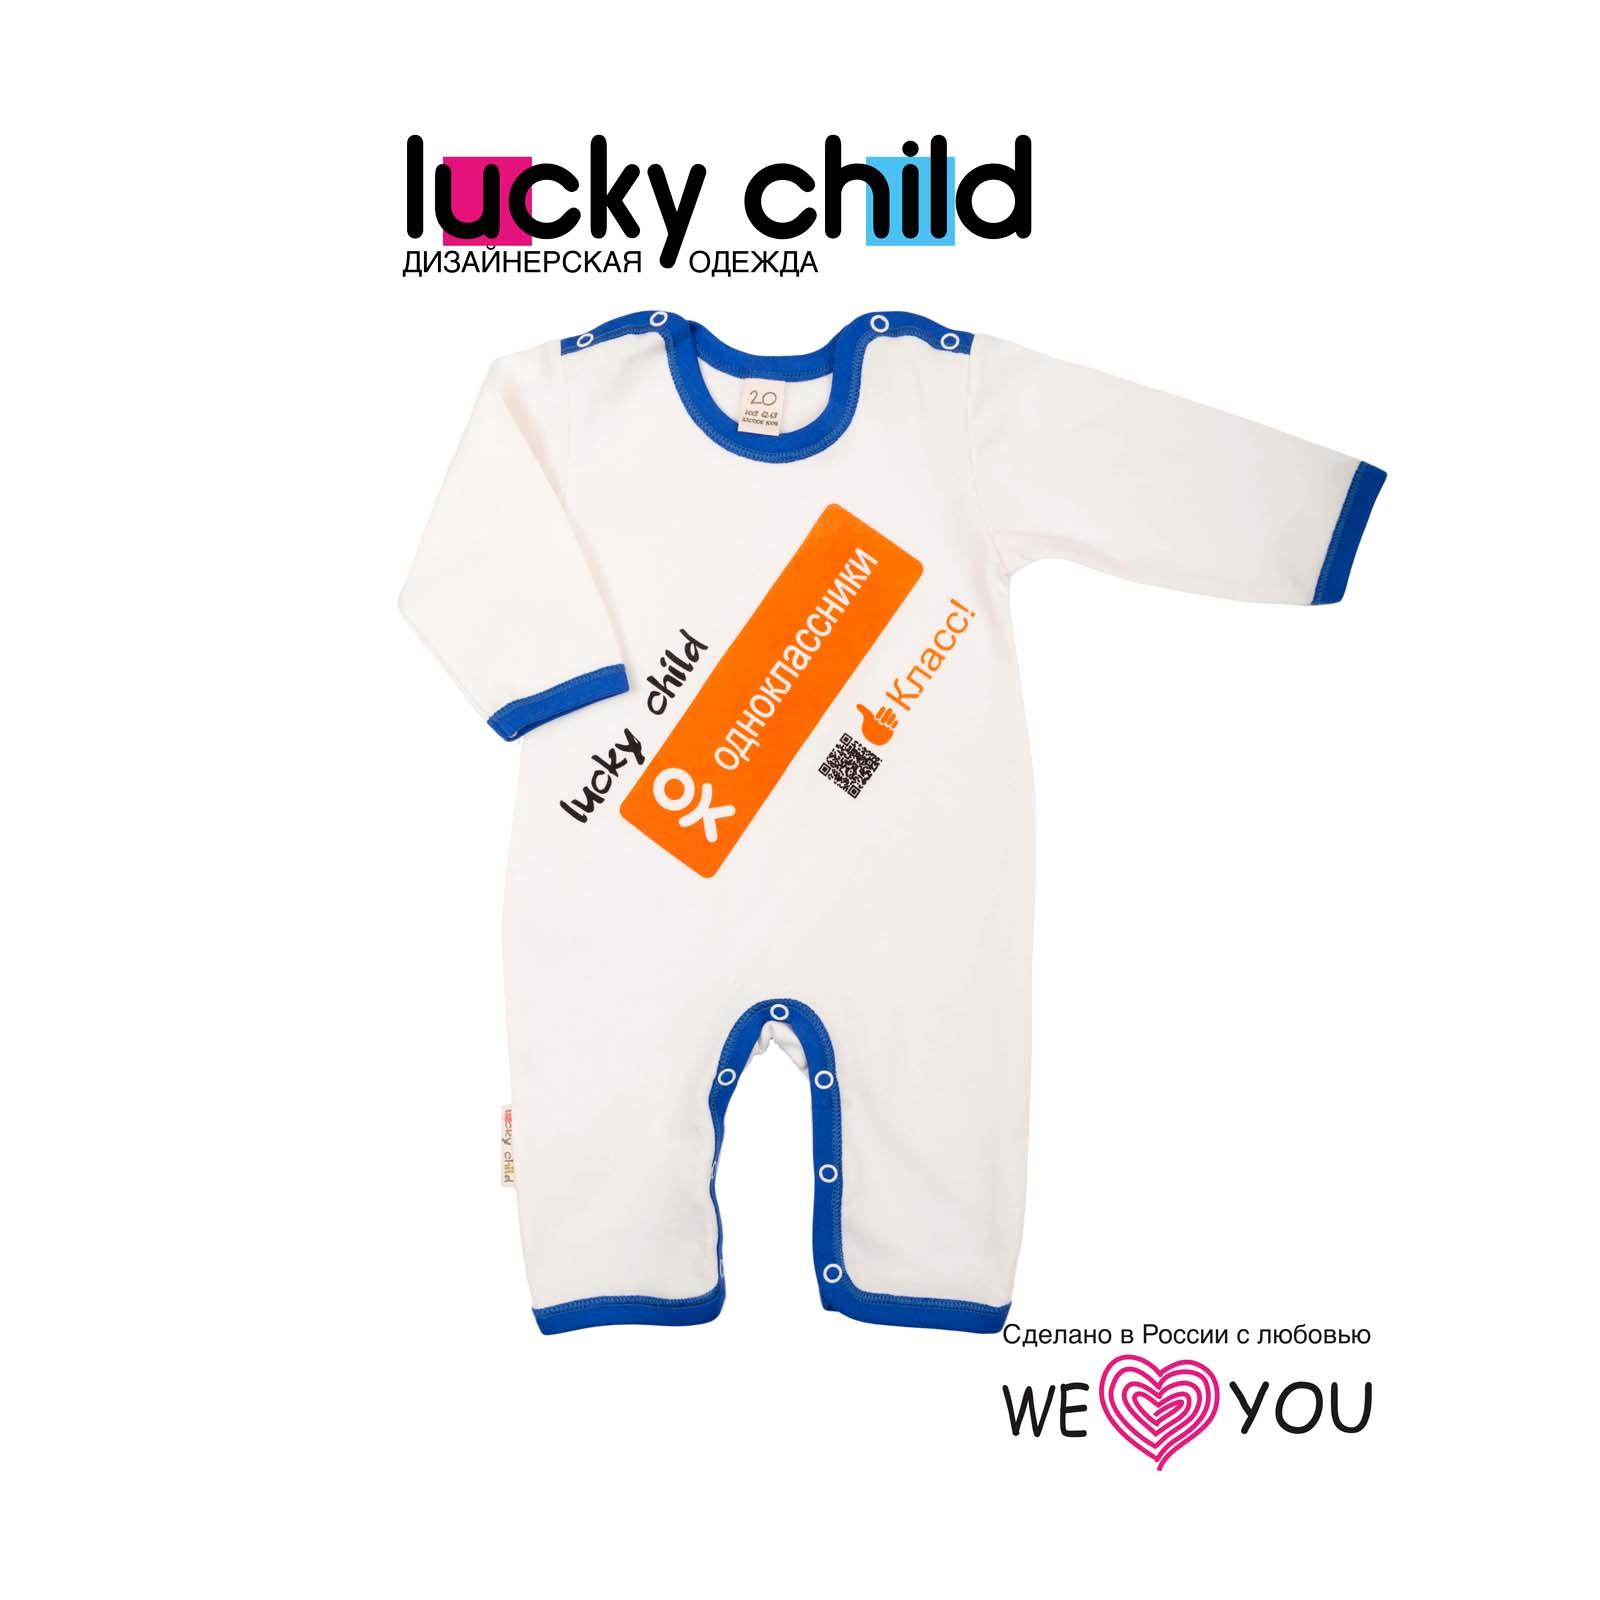 Комбинезон Lucky Child с надписью Одноклассники размер 62<br>